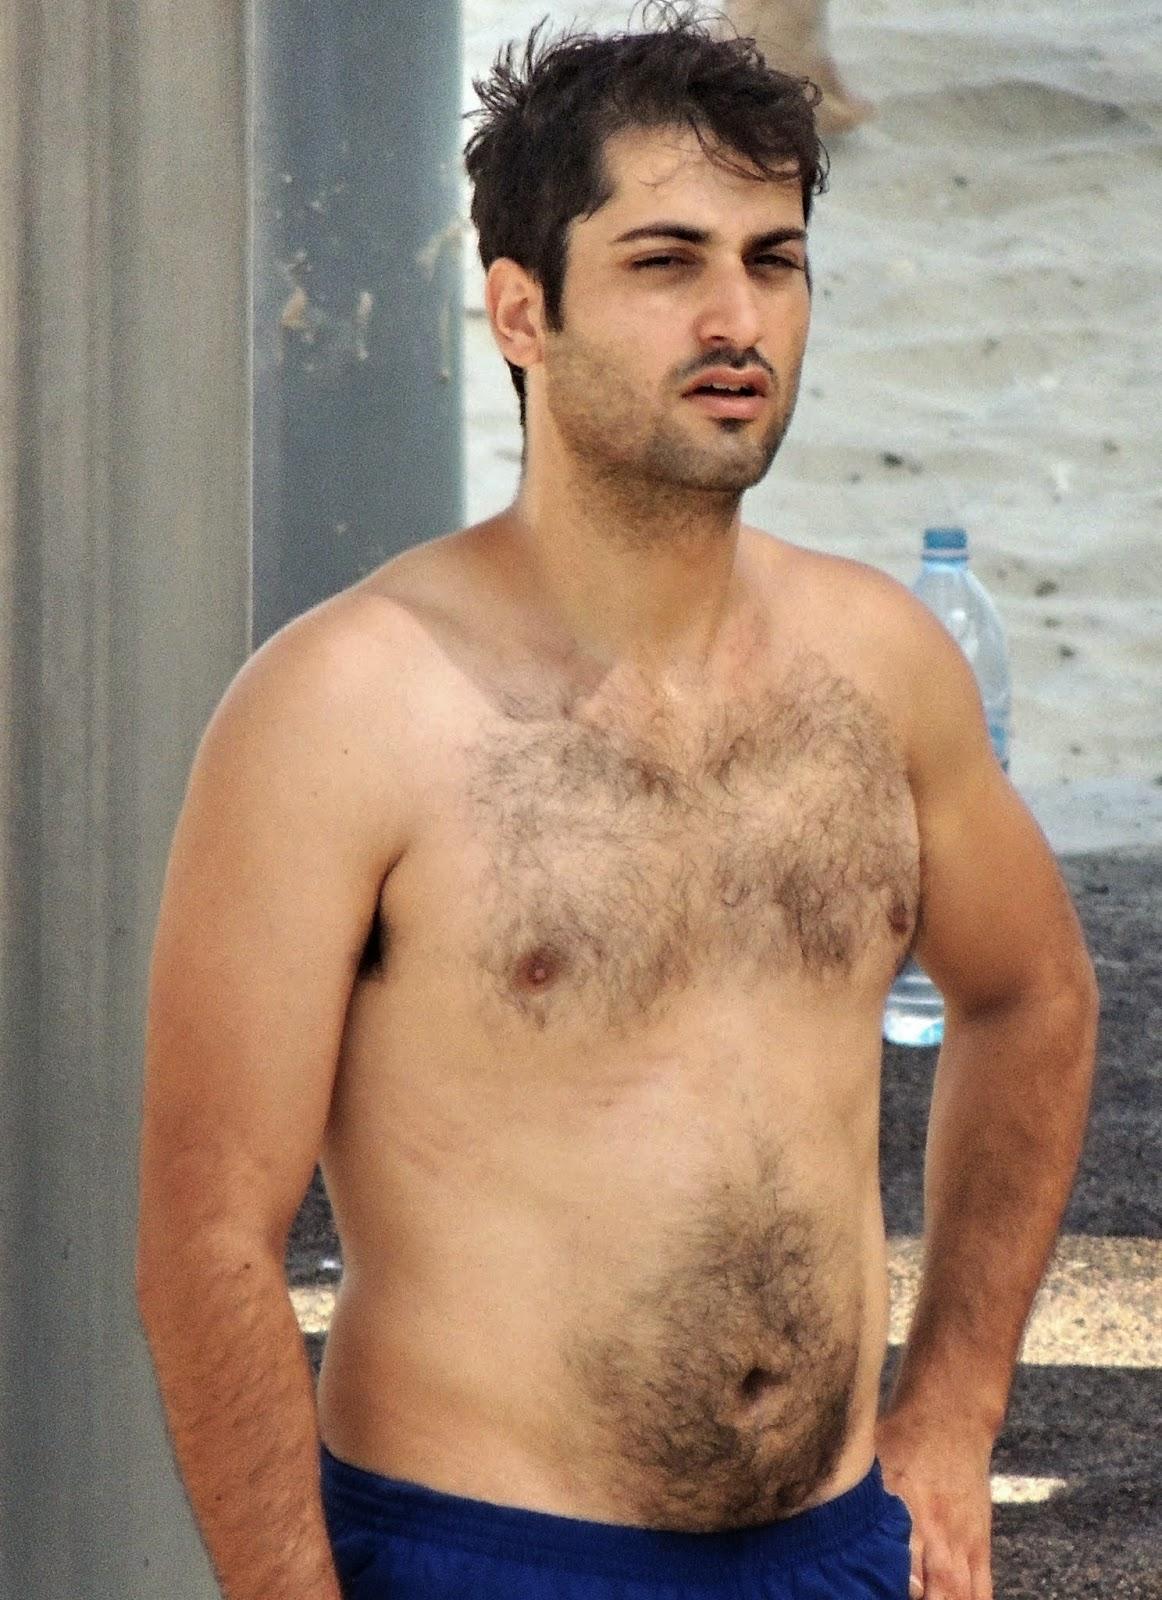 Hairy chested men naked